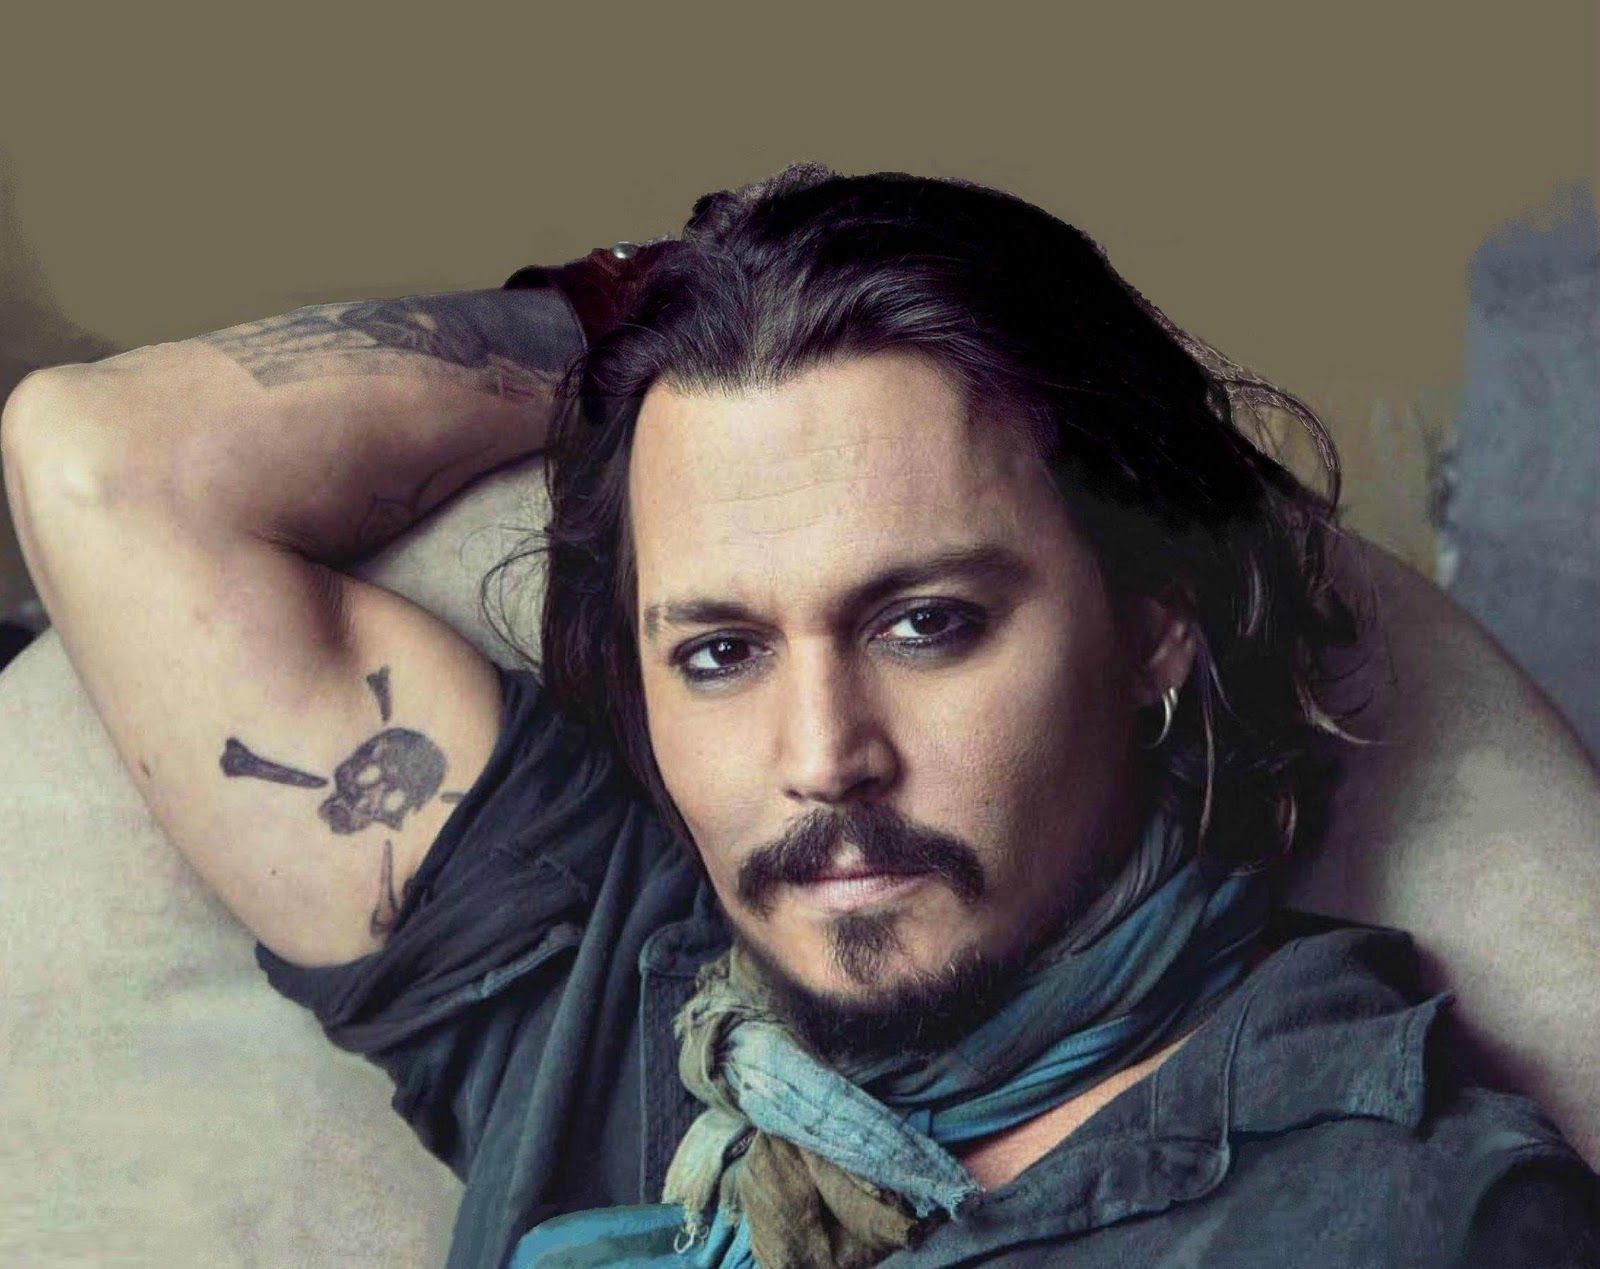 Google chrome themes johnny depp - Johnny Depp Favorite Celebrity Tattoo Design Johnny Depp Or Better Known As Jack